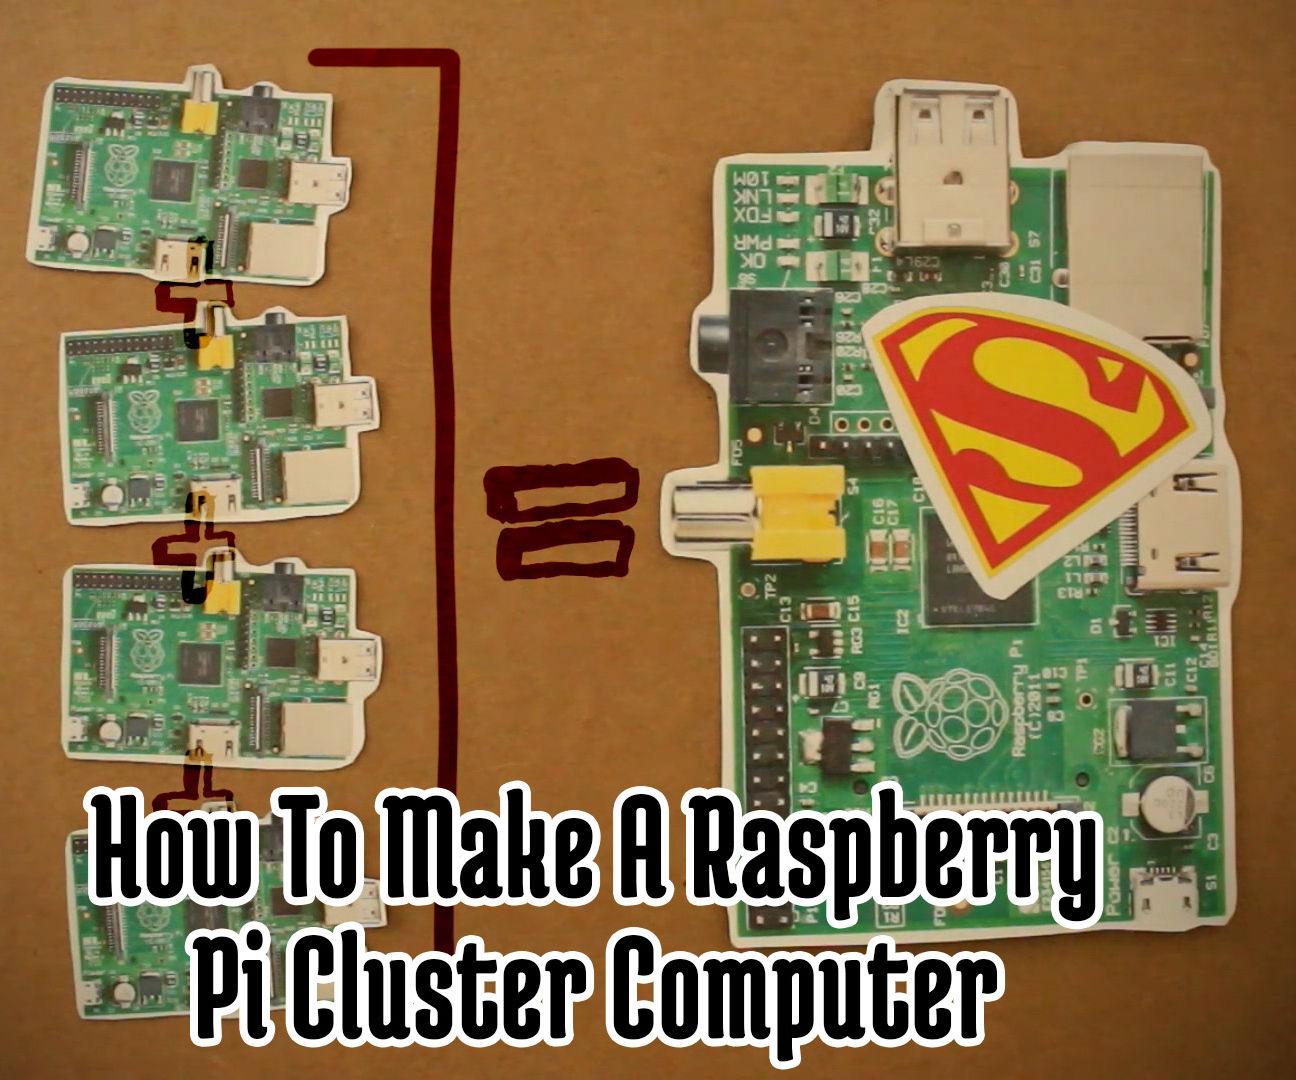 How To Make A Raspberry Pi SuperComputer!